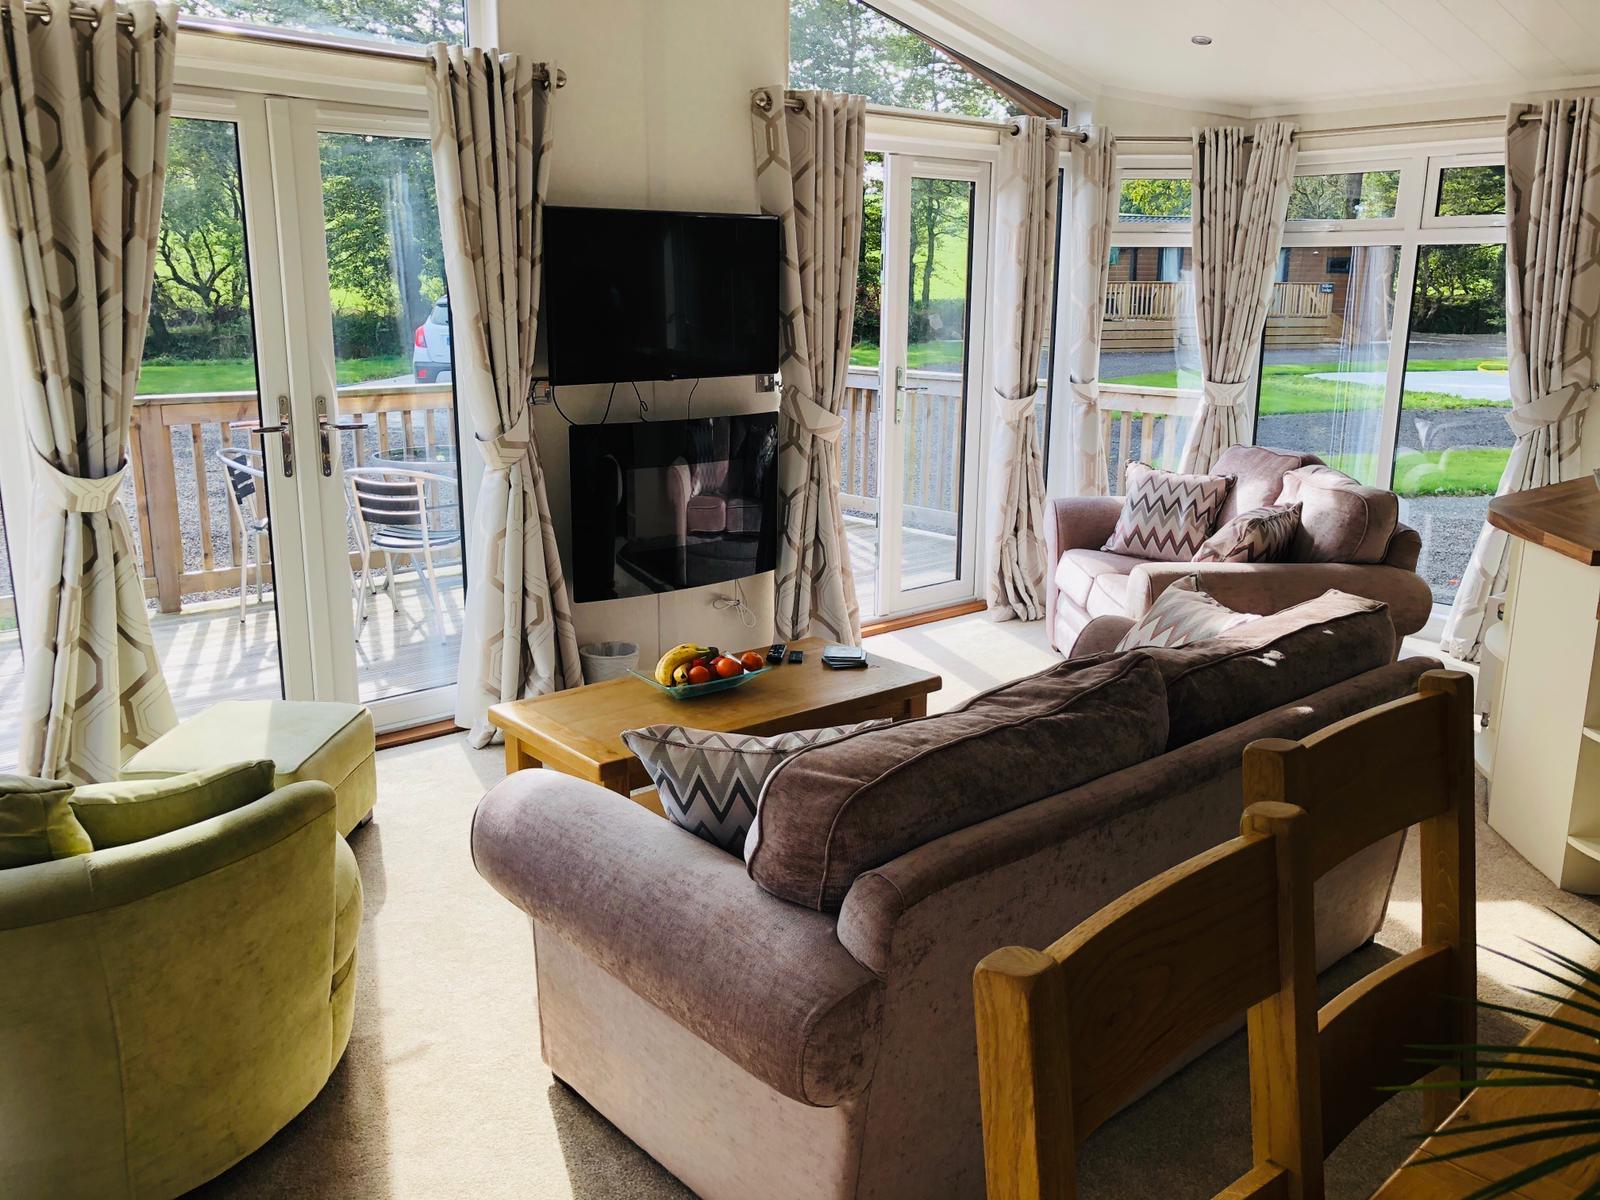 Luxury Lodges for sale, Devon